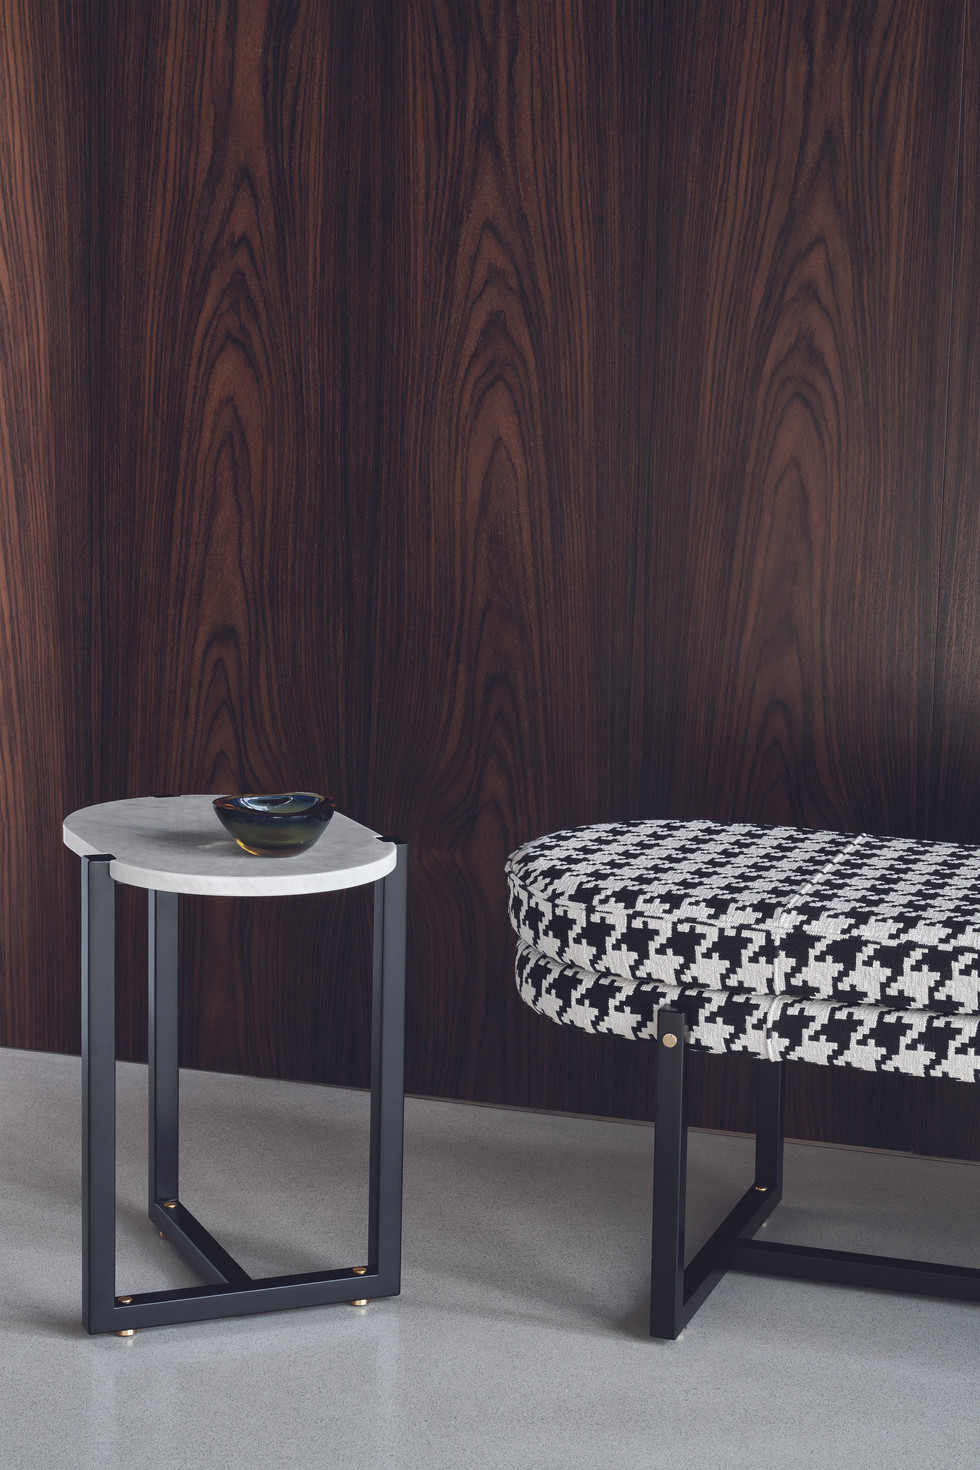 arflex-sigmund-design-studio-asai_amb4j